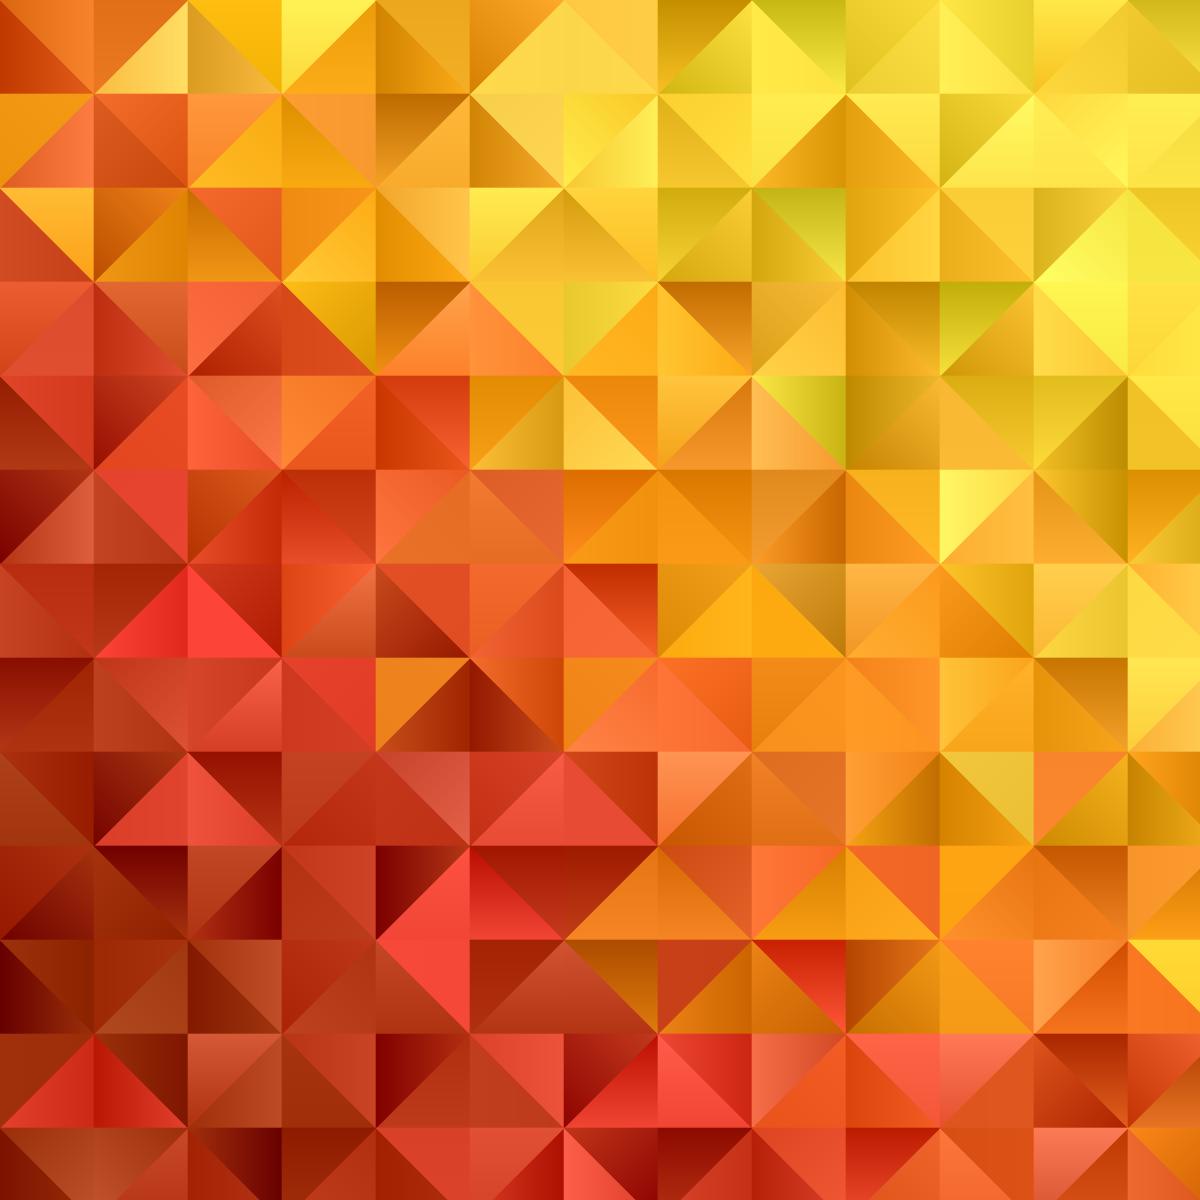 HalftonePro Polygons.